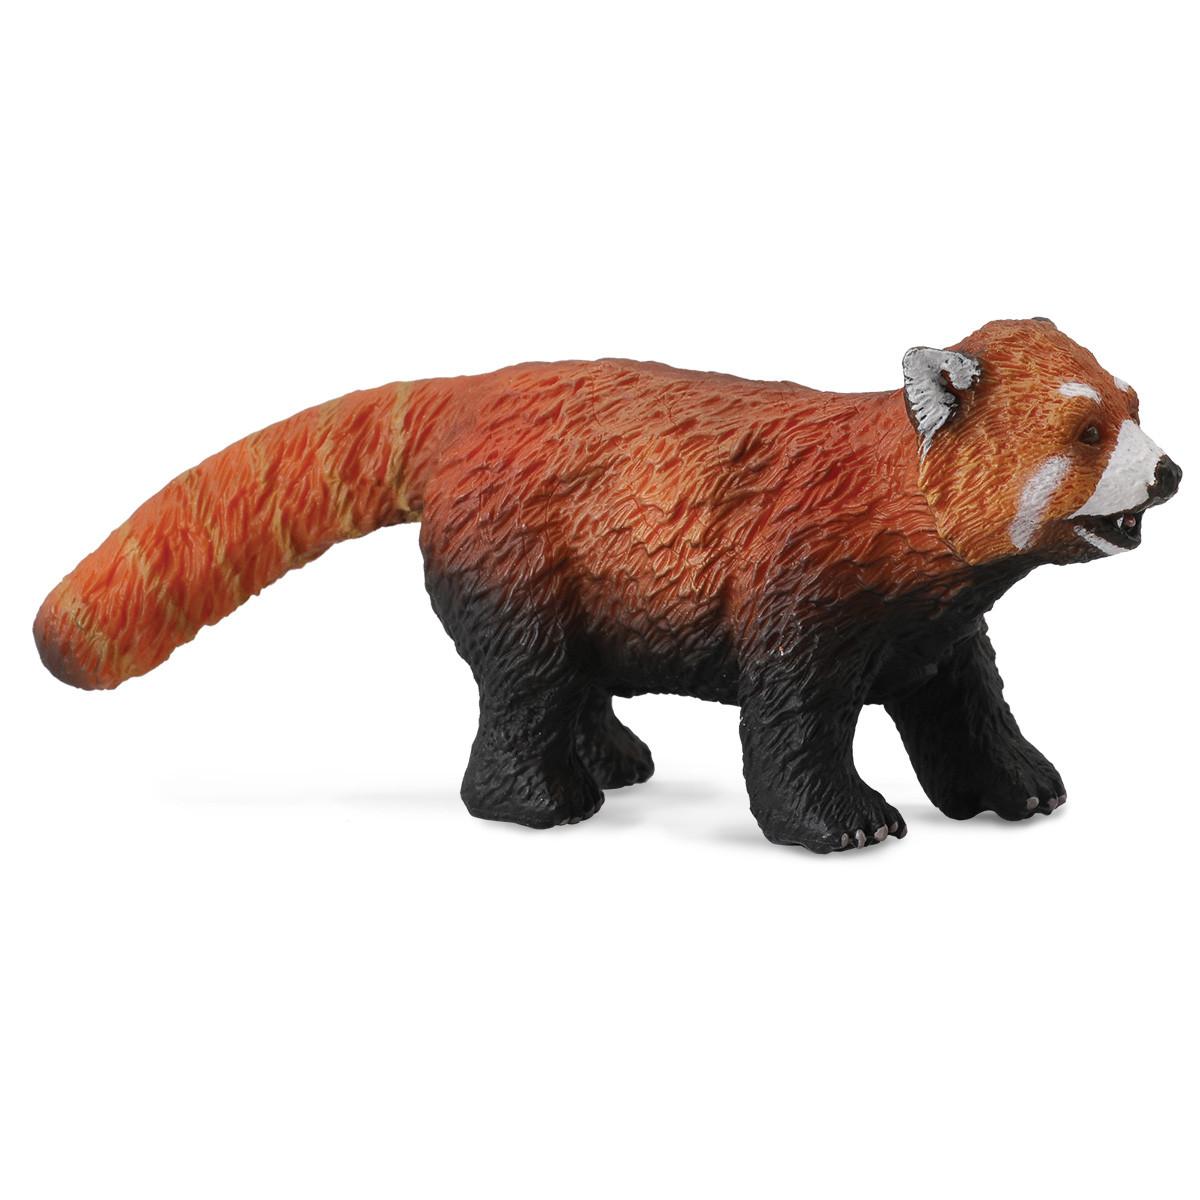 CollectA Фигурка Красная панда, длина 7.5 см